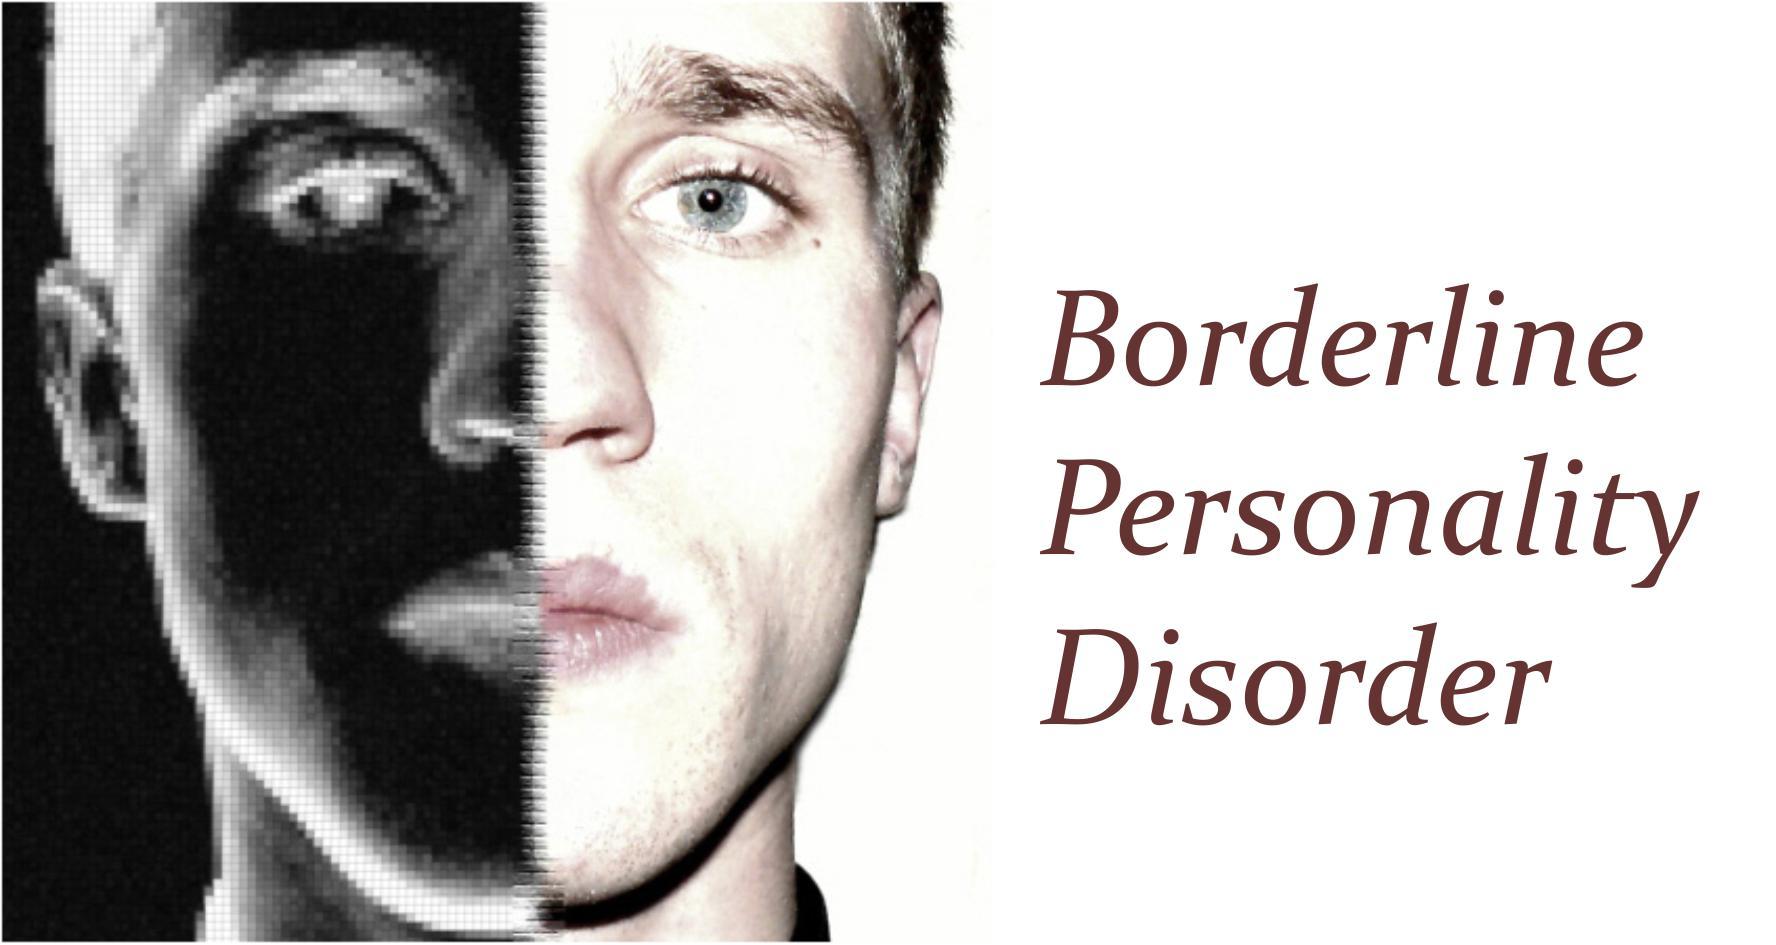 Litigating Custody Involving Borderline Personality